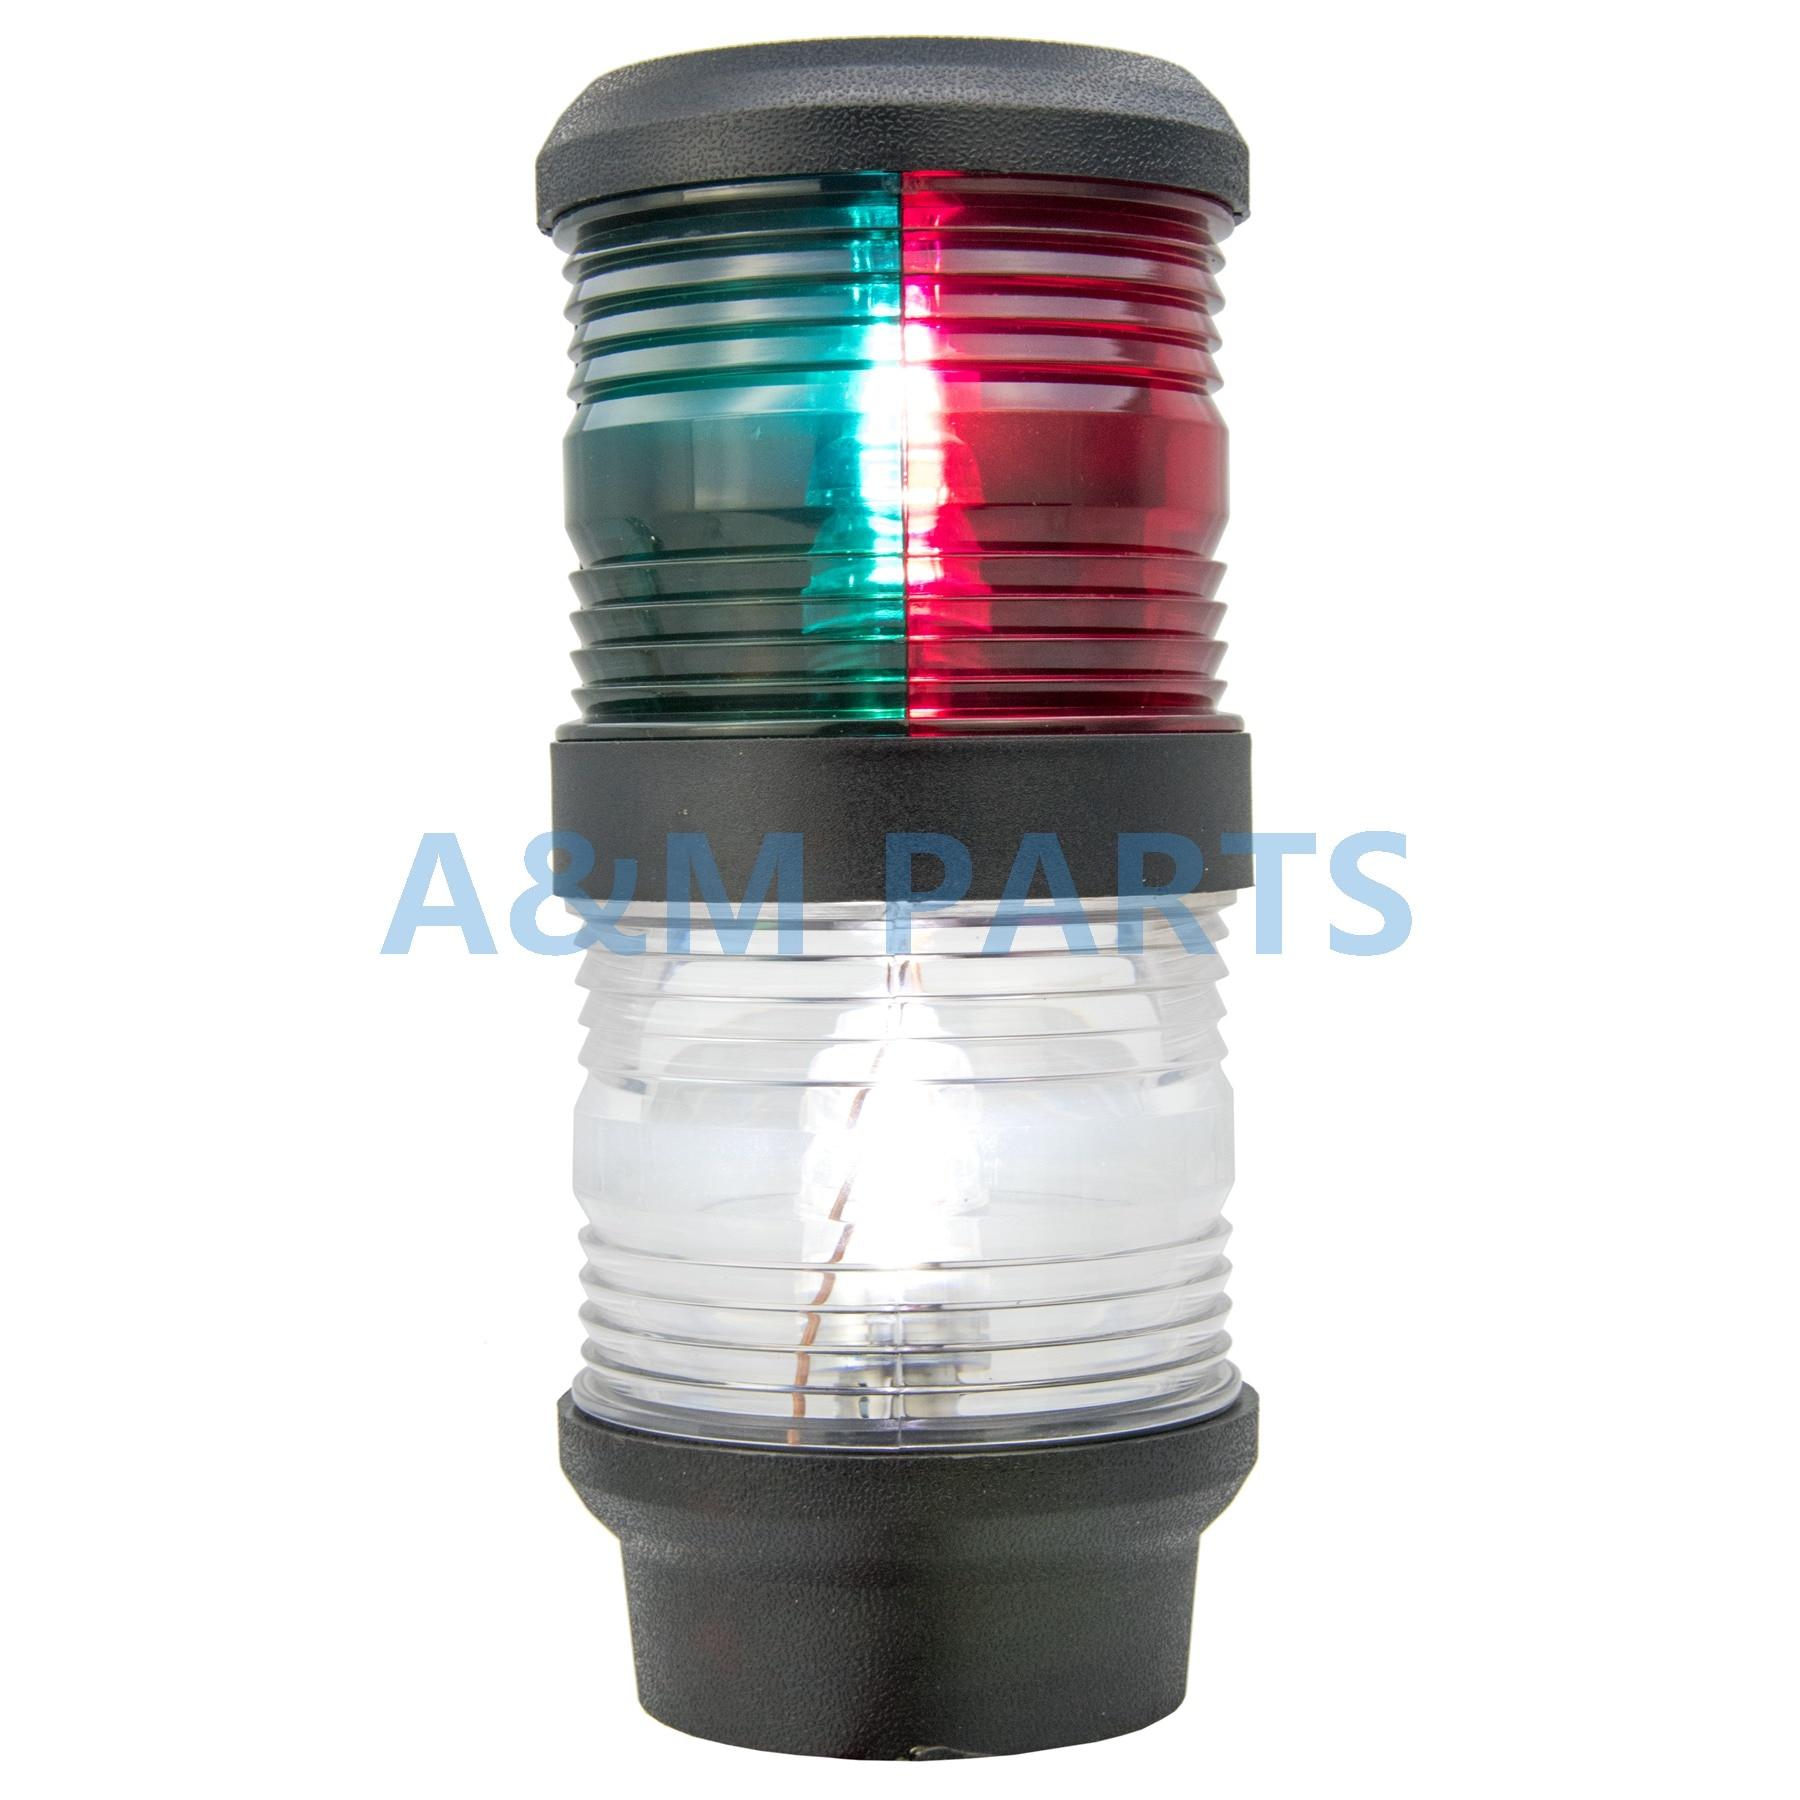 LED Bi Color All Round Anchor Light Boat Marine Navigation Masthead Light for Sailboat